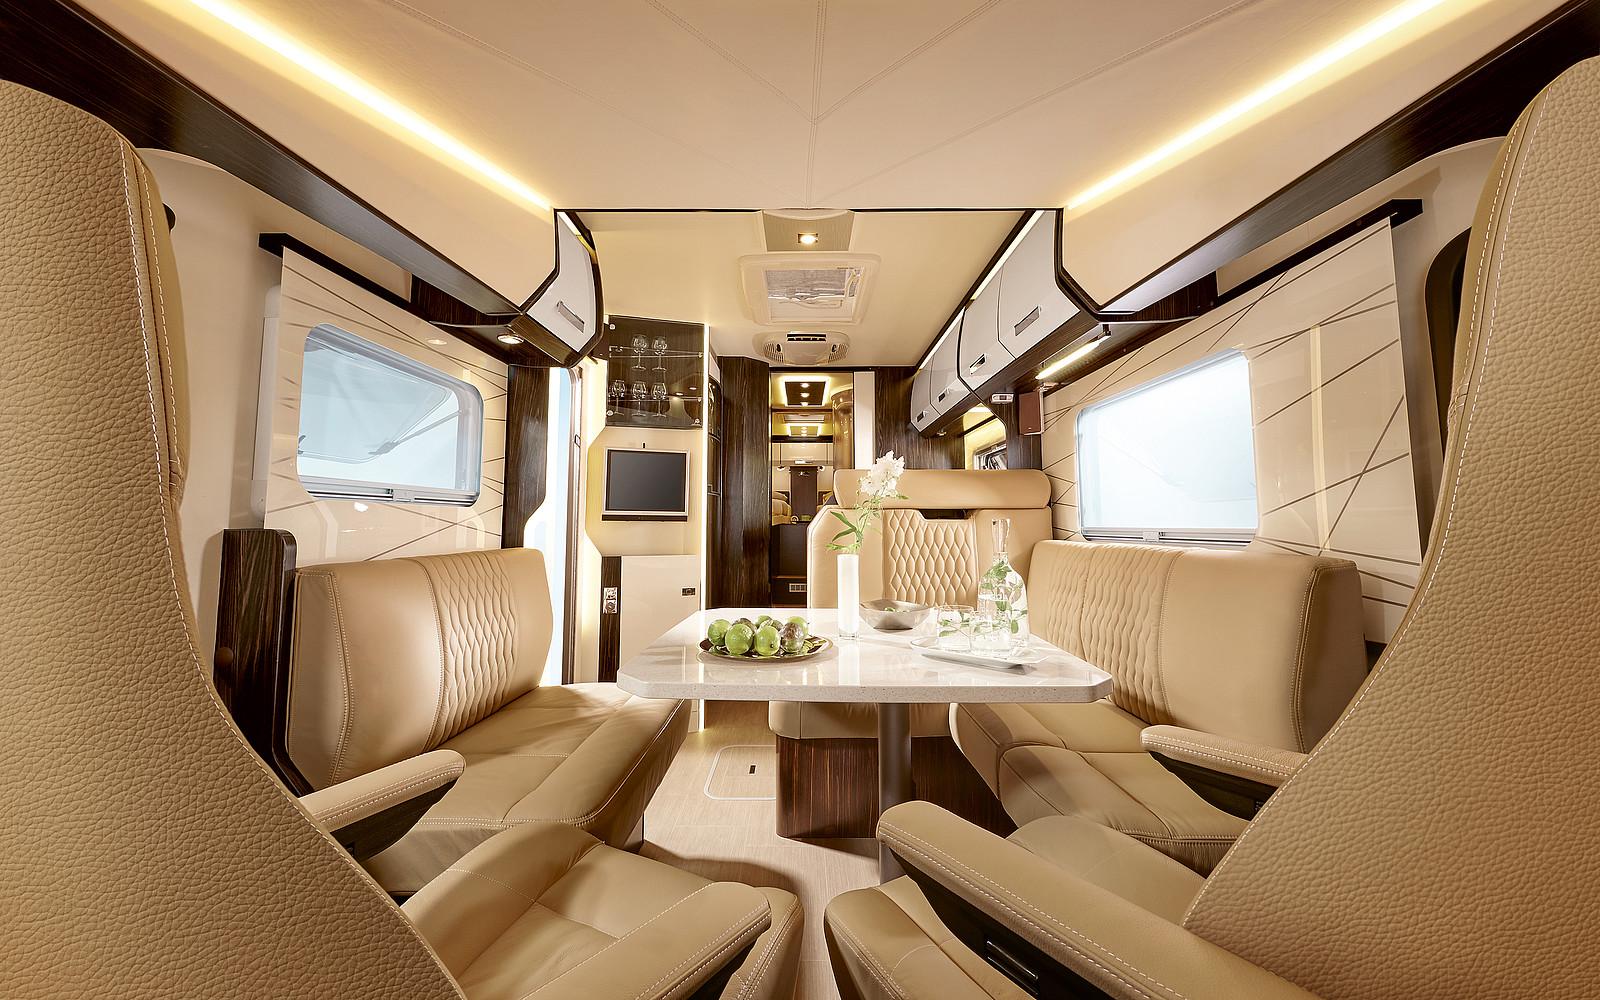 2020 Burstner Elegance Motorhome - Interior Photo - Front View Lounge Area